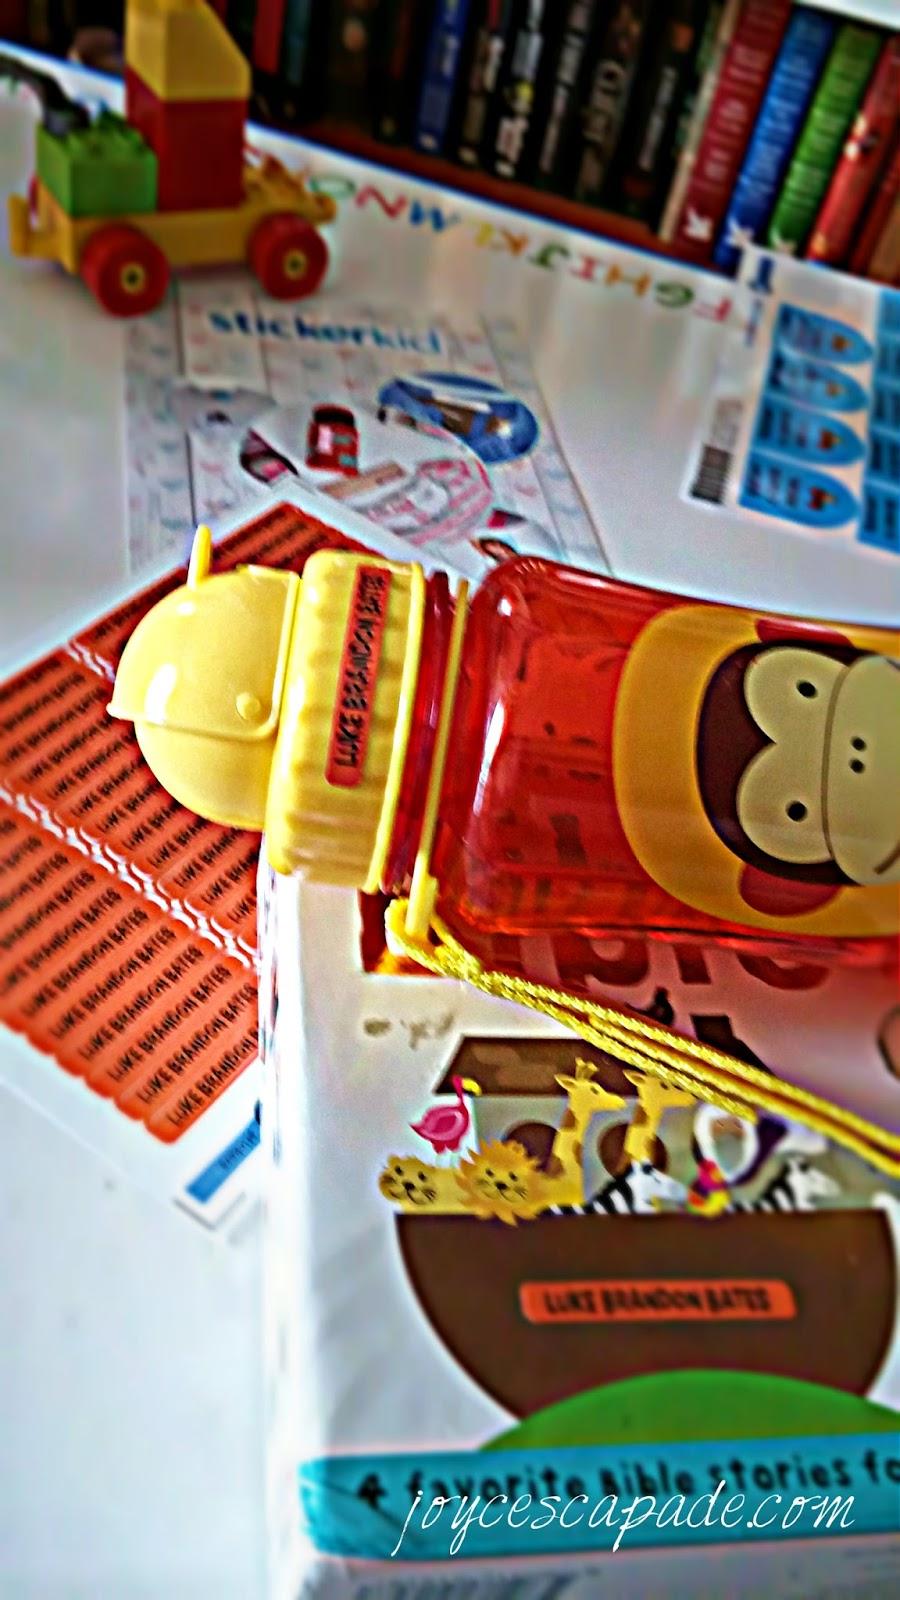 Toys N Joys Website : Discover stickerkid pack of stickers joy n escapade